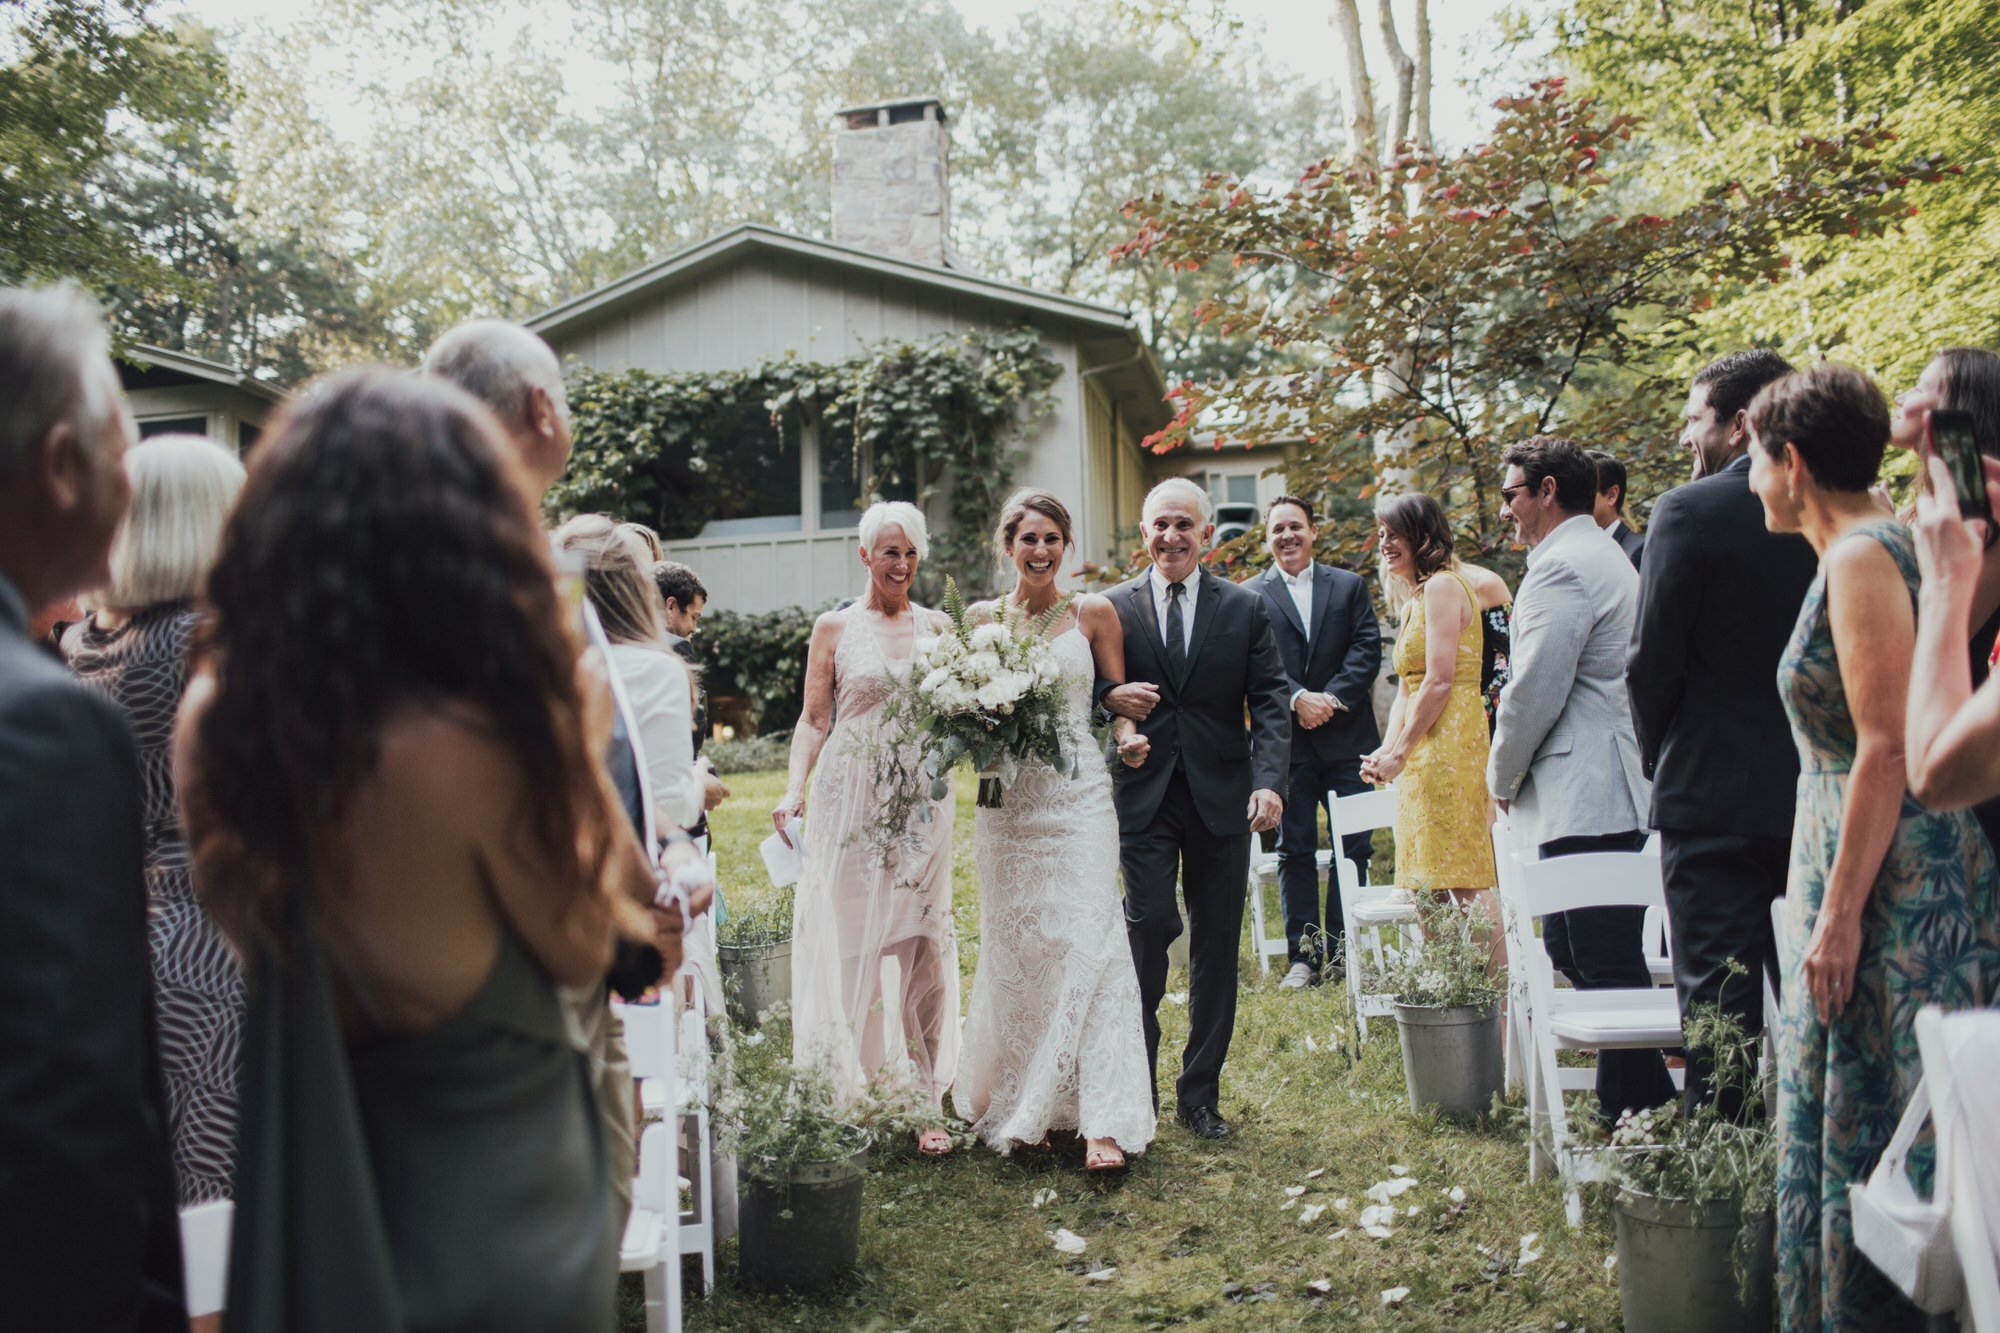 emily-aaron-rochester-new-york-wedding-photographer-61.JPG